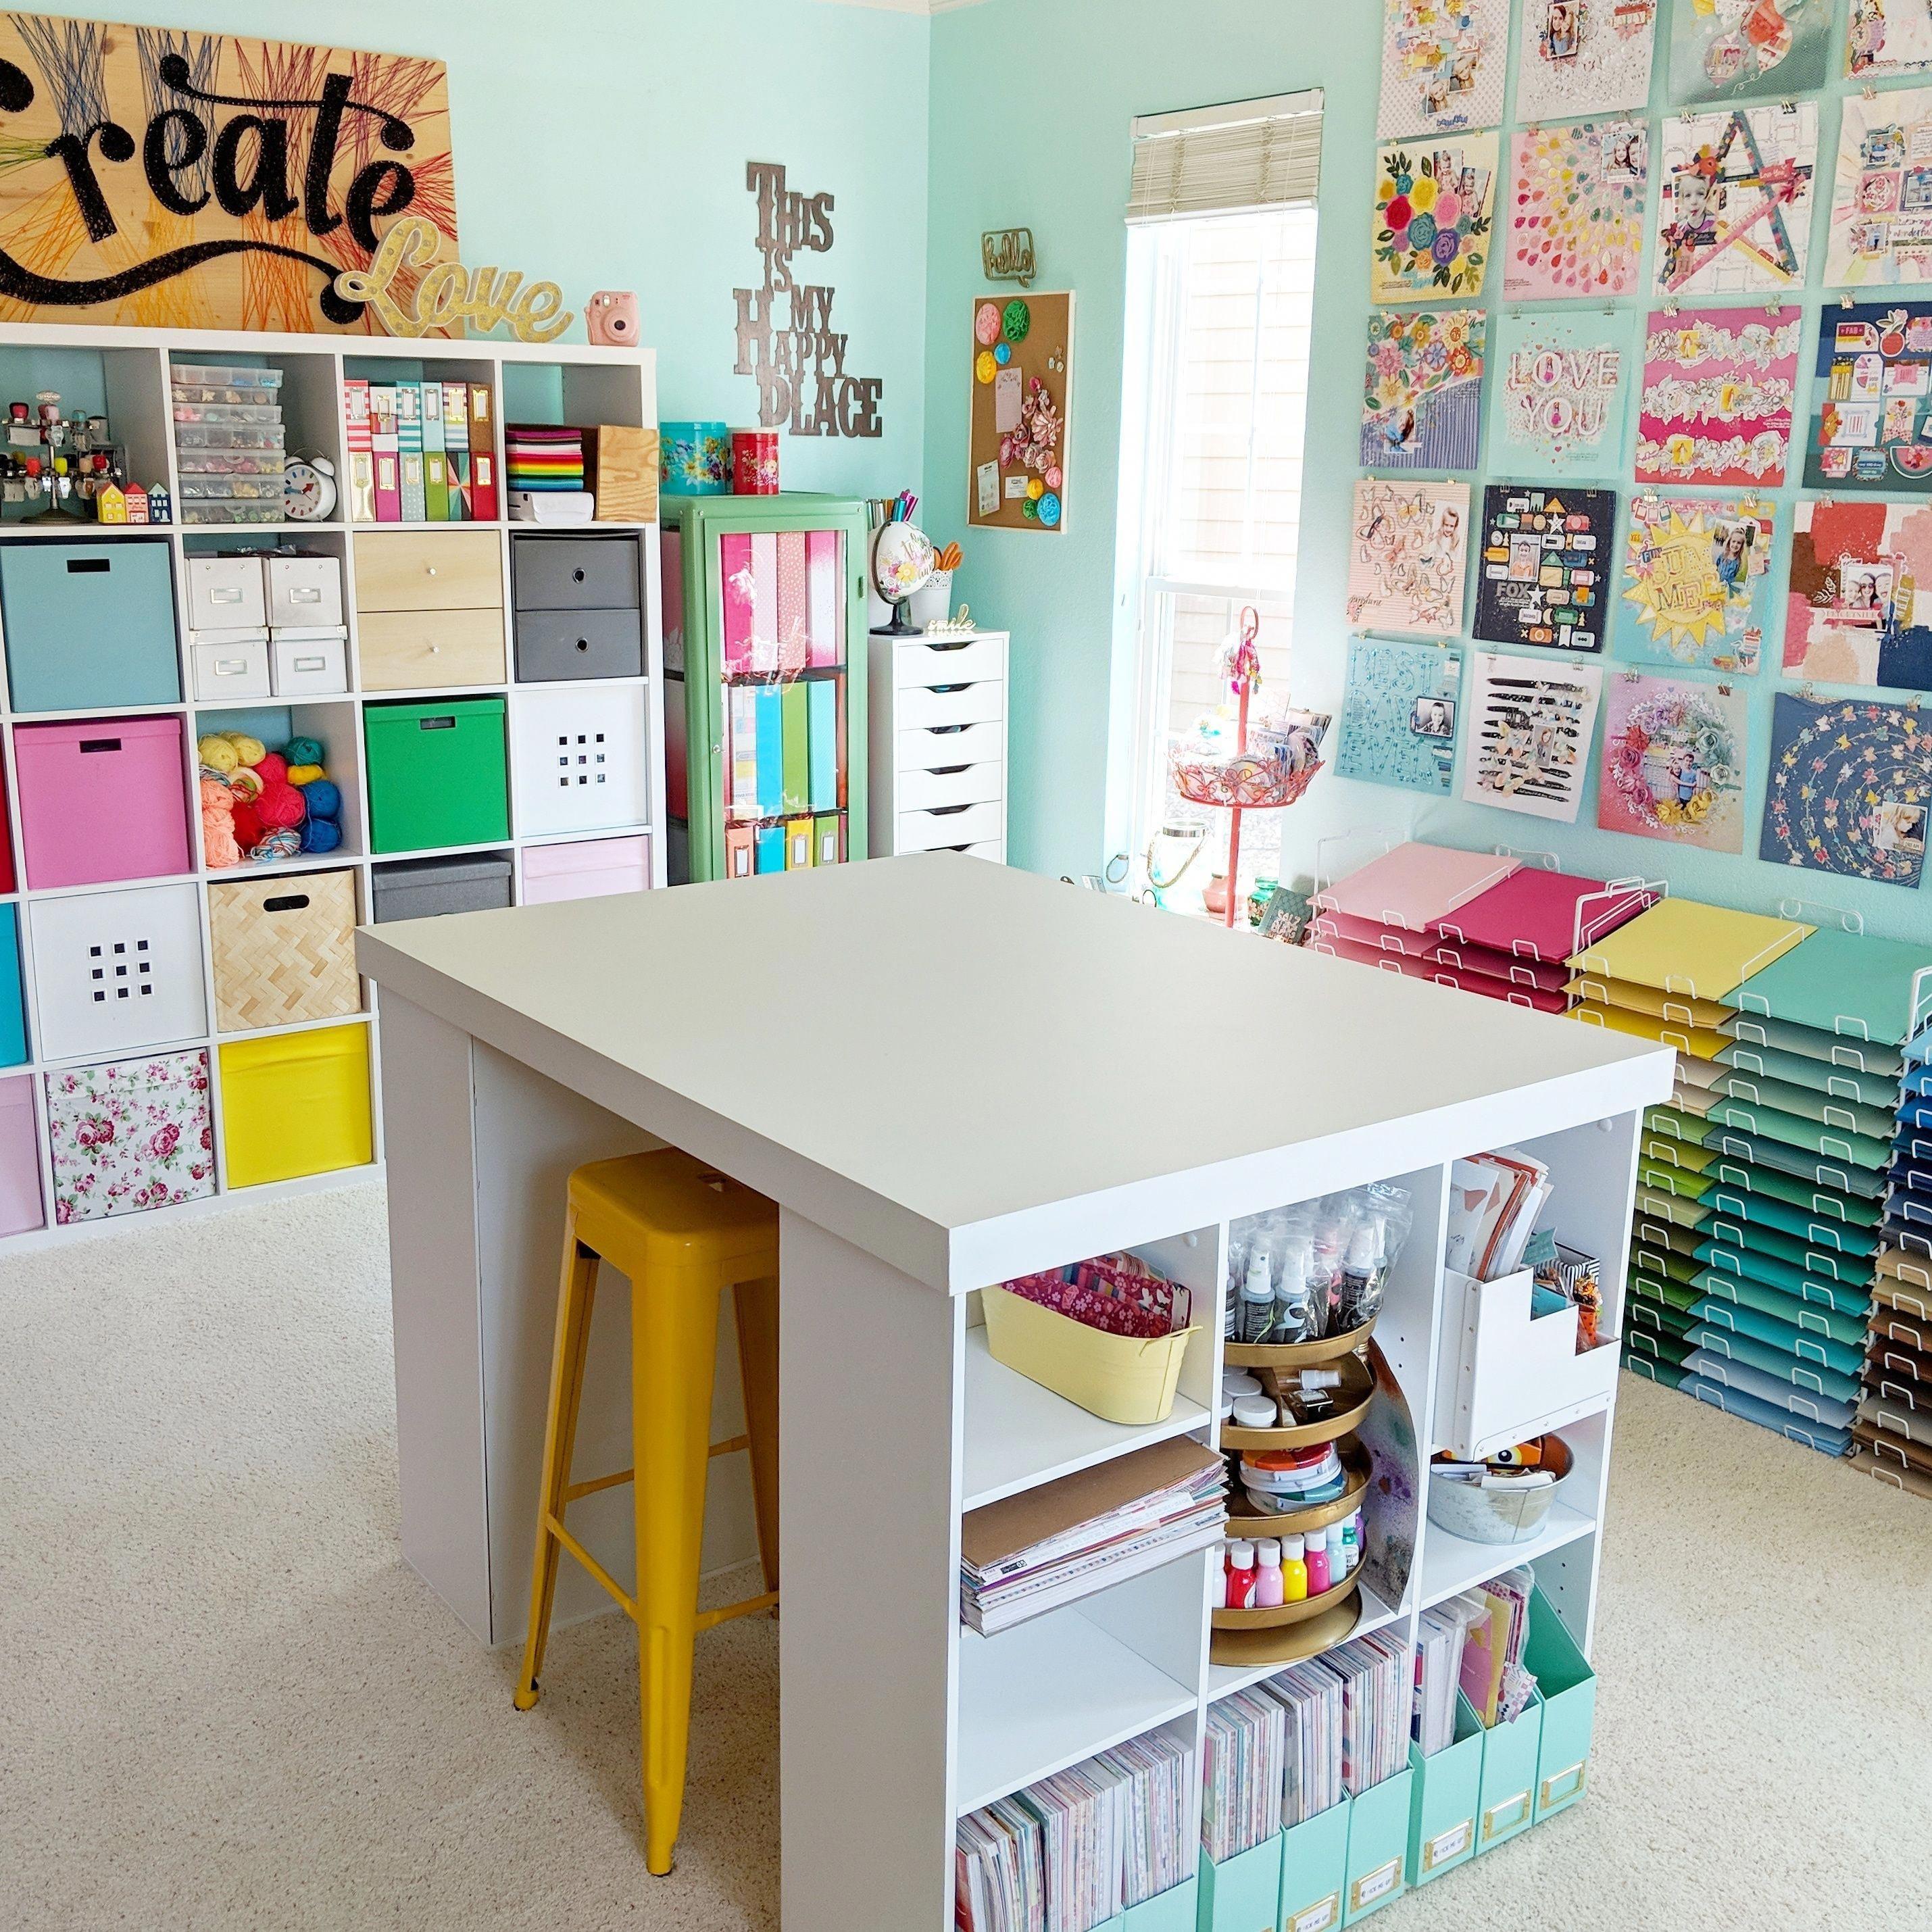 Guarded Scrapbooking Kits Love #scrapbookingkieszonkowy #ScrapbookSupplies #ateliercoutureamenagement